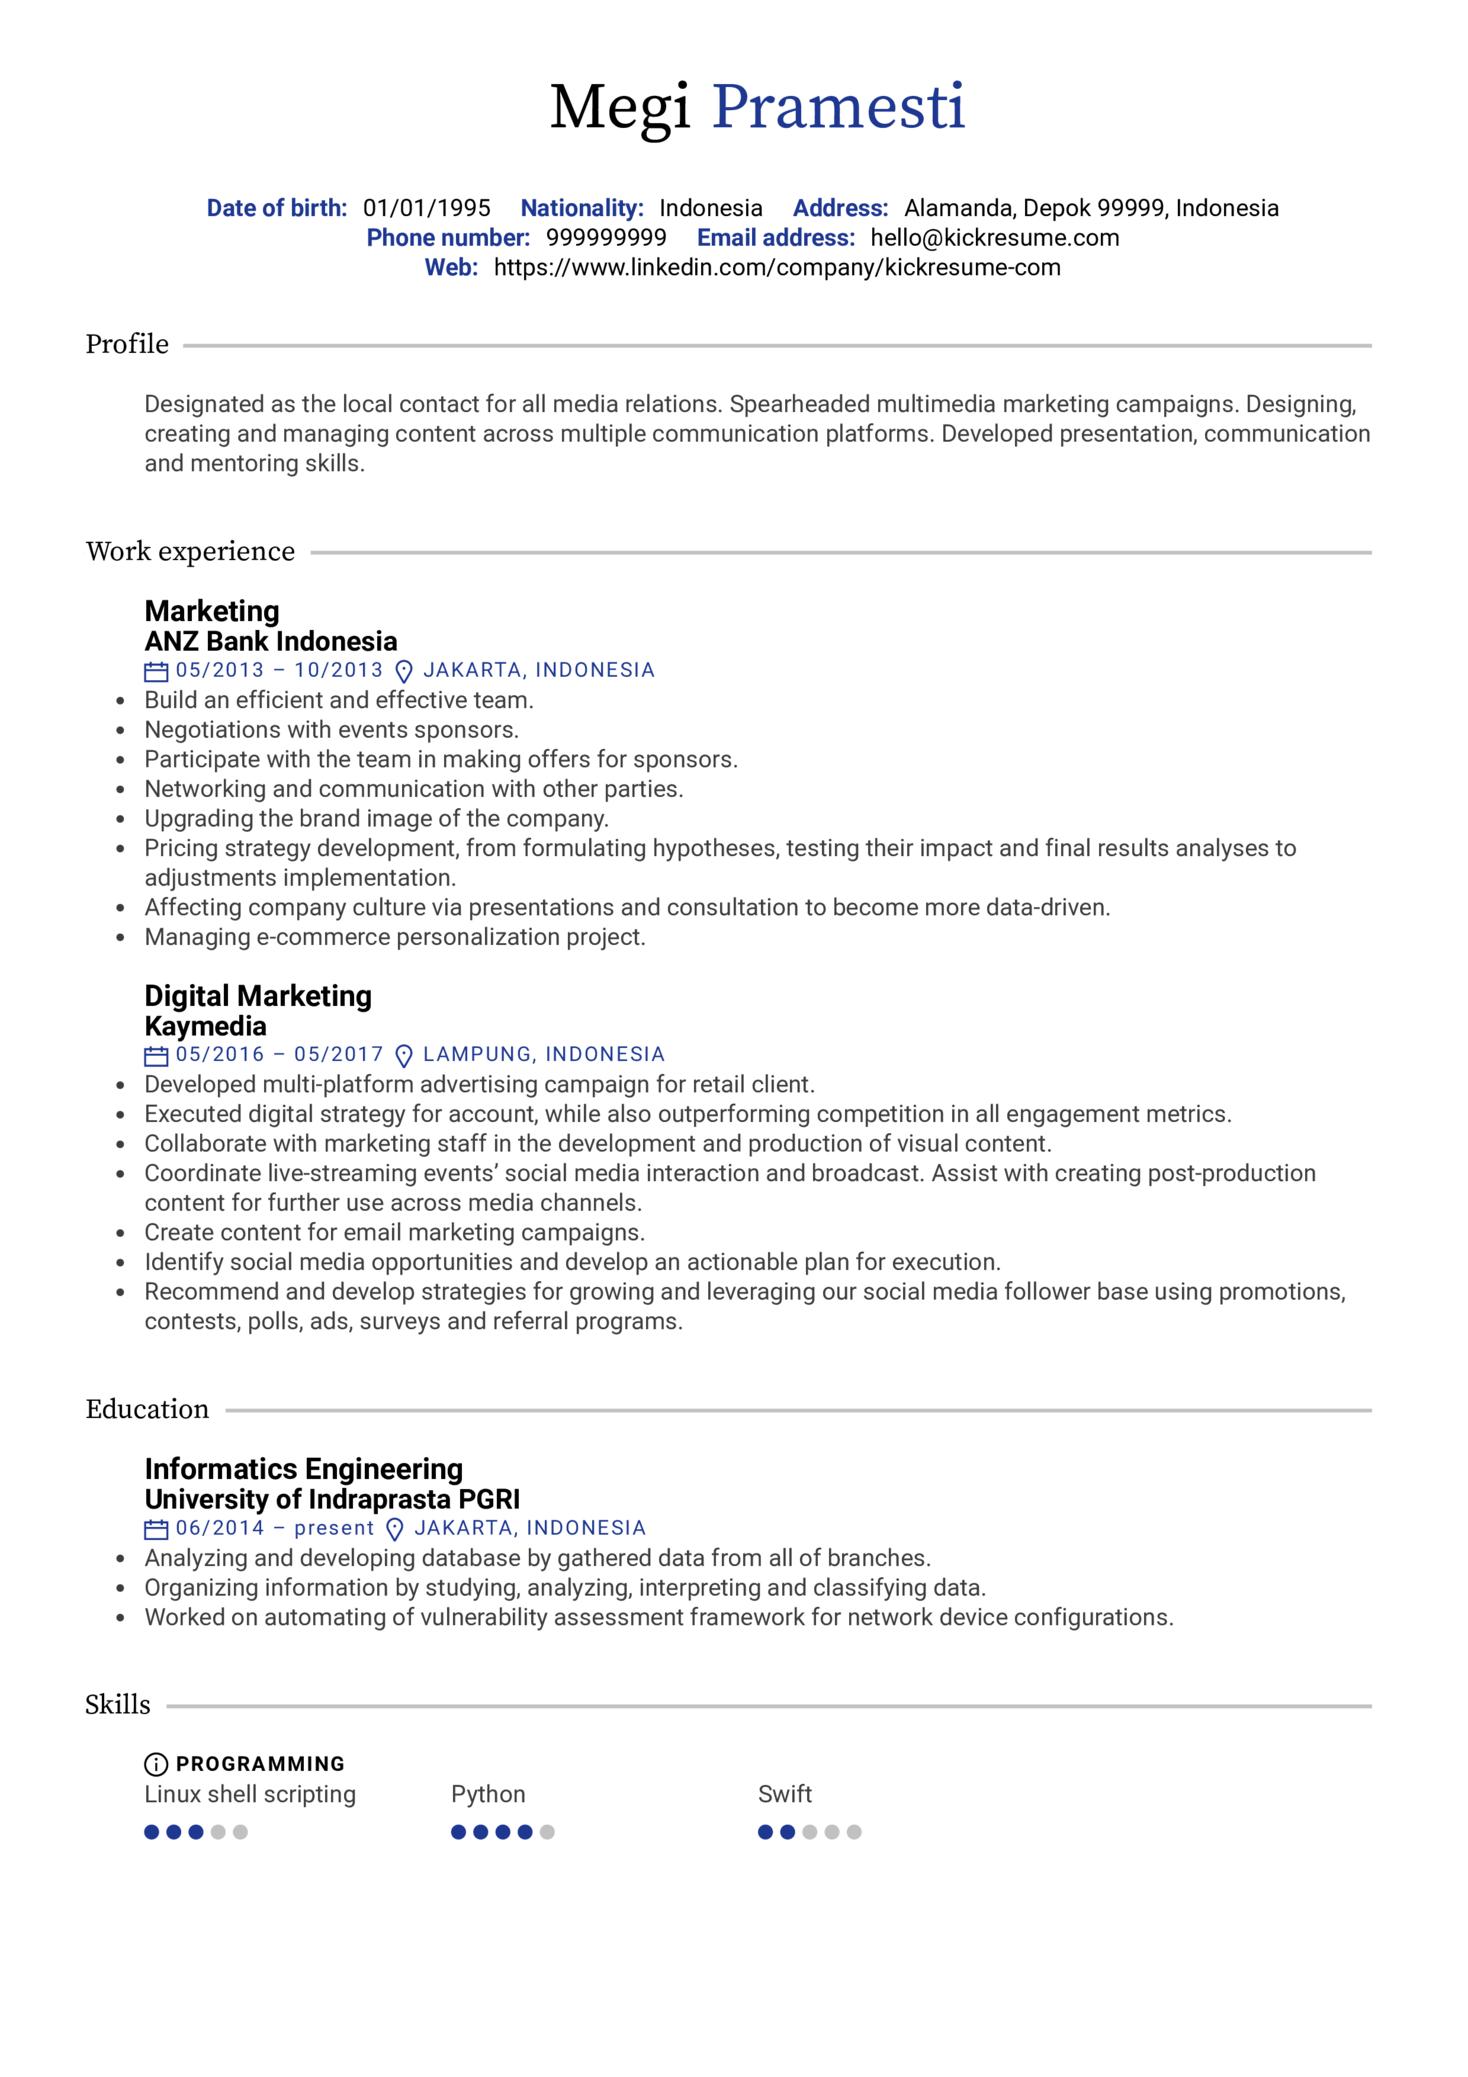 Digital Marketing Resume Sample (Part 1)